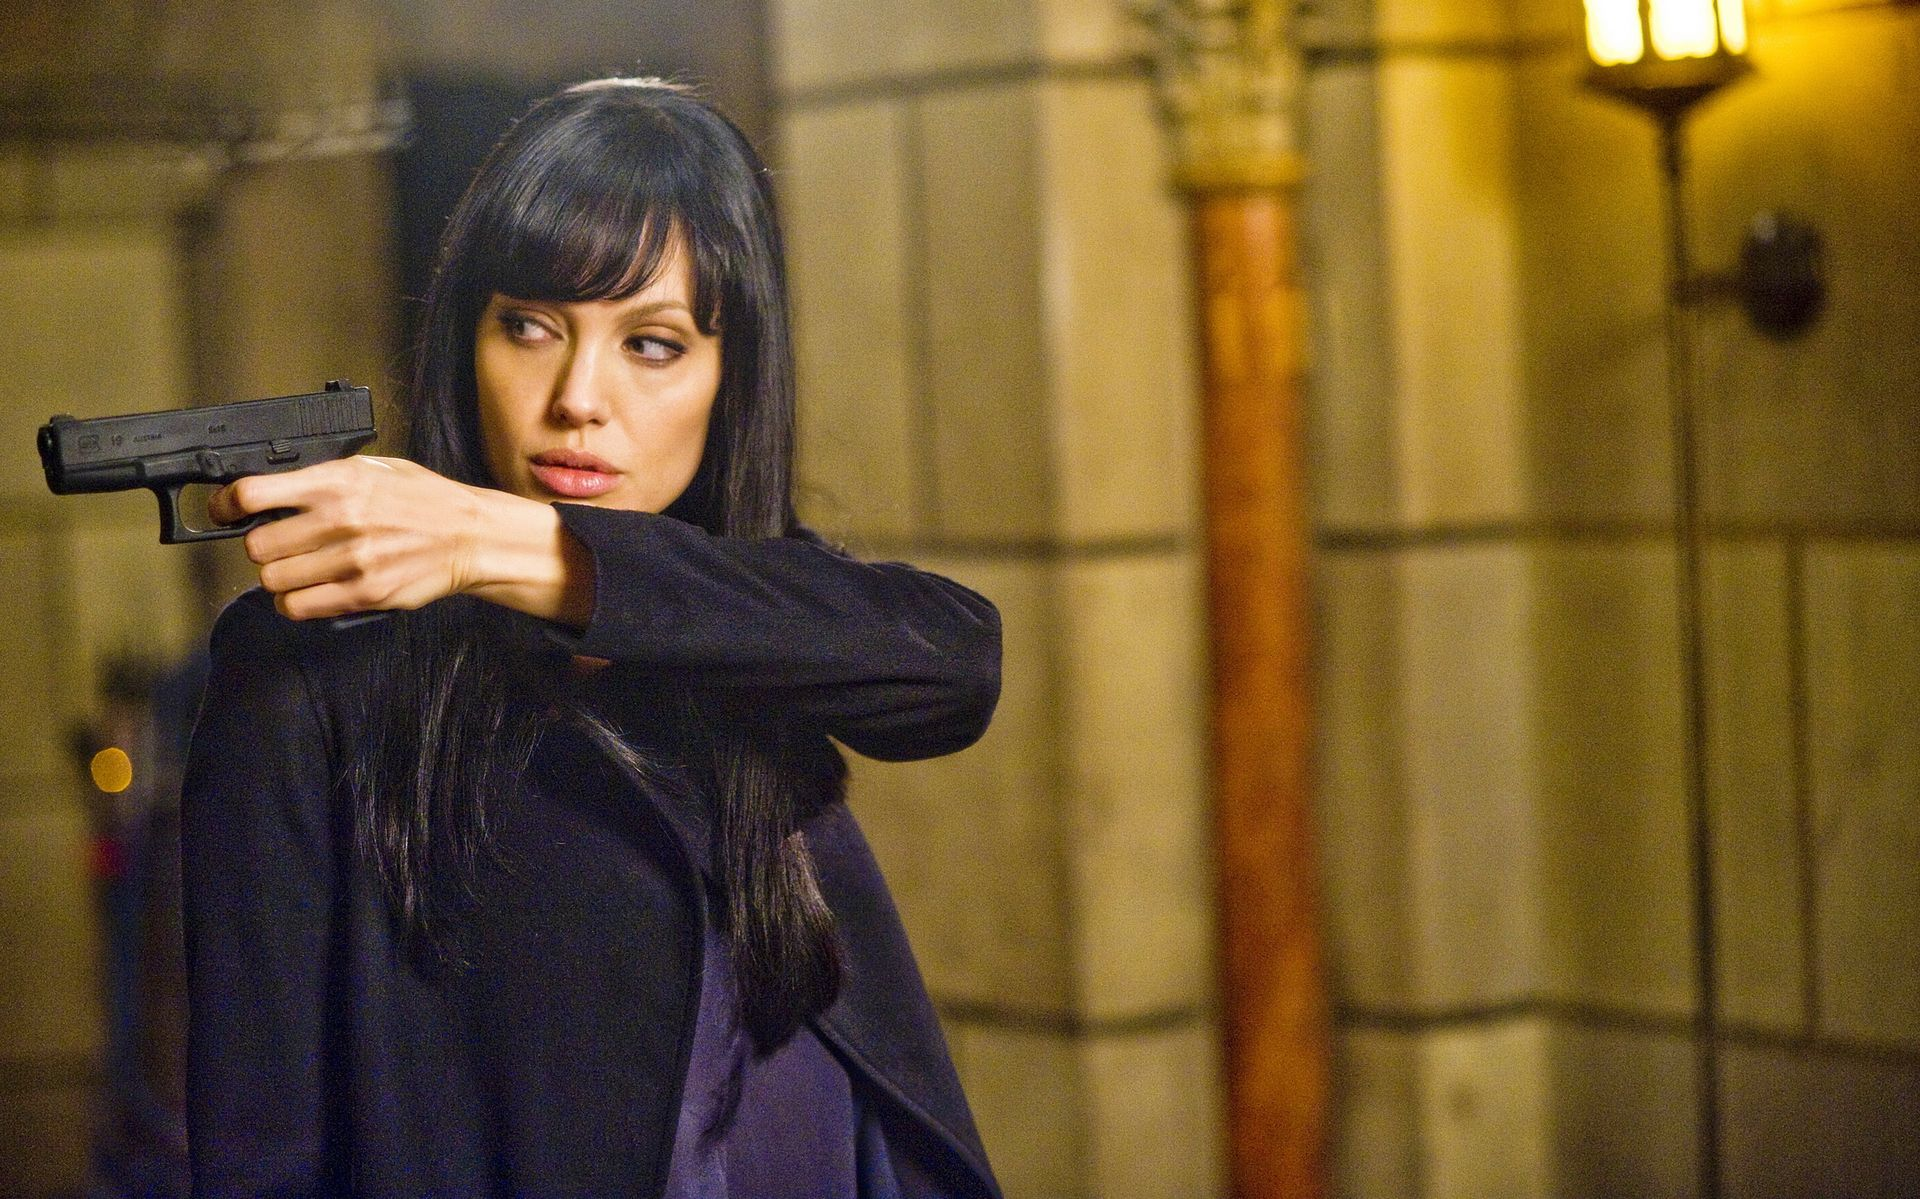 Angelina Jolie Sexi Movie angelina jolie's sexiest films - 10 hottest angelina jolie